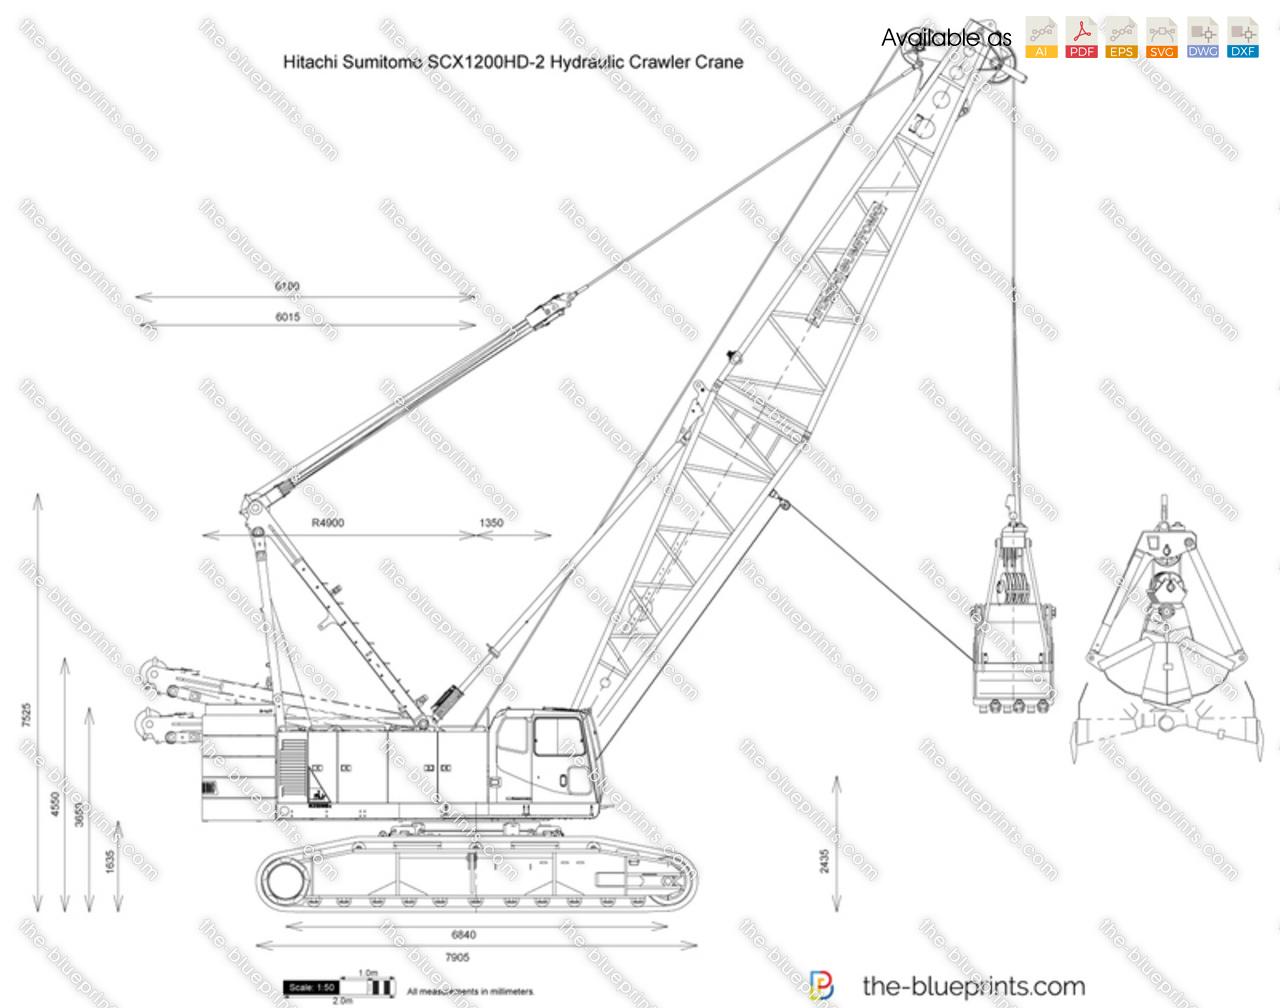 Hitachi Sumitomo SCX1200HD-2 Hydraulic Crawler Crane